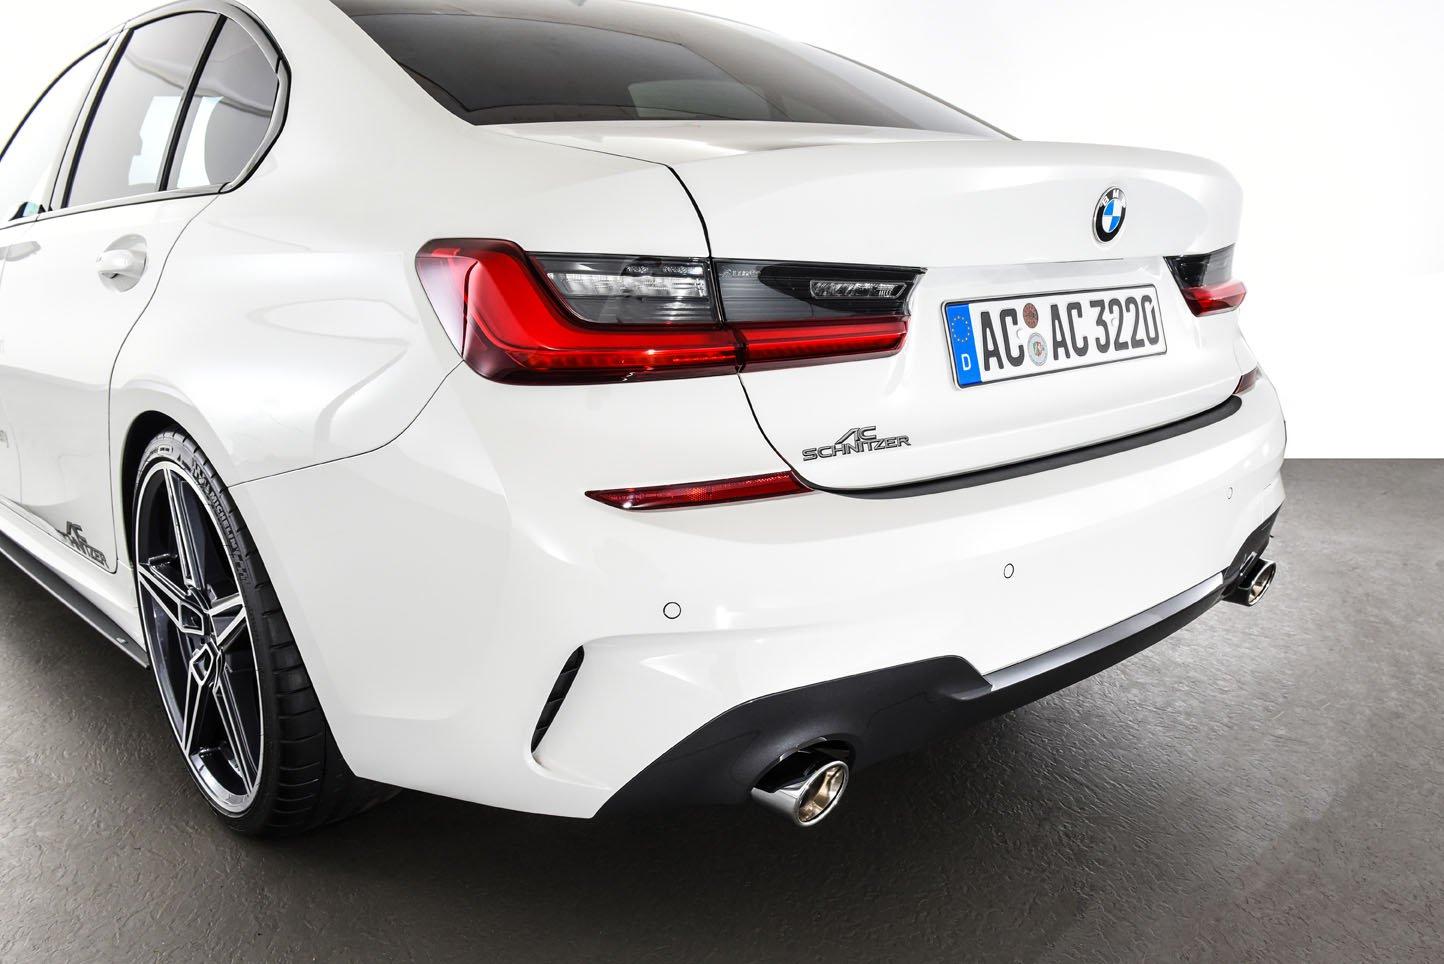 BMW-3-Series-by-AC-Schnitzer-12